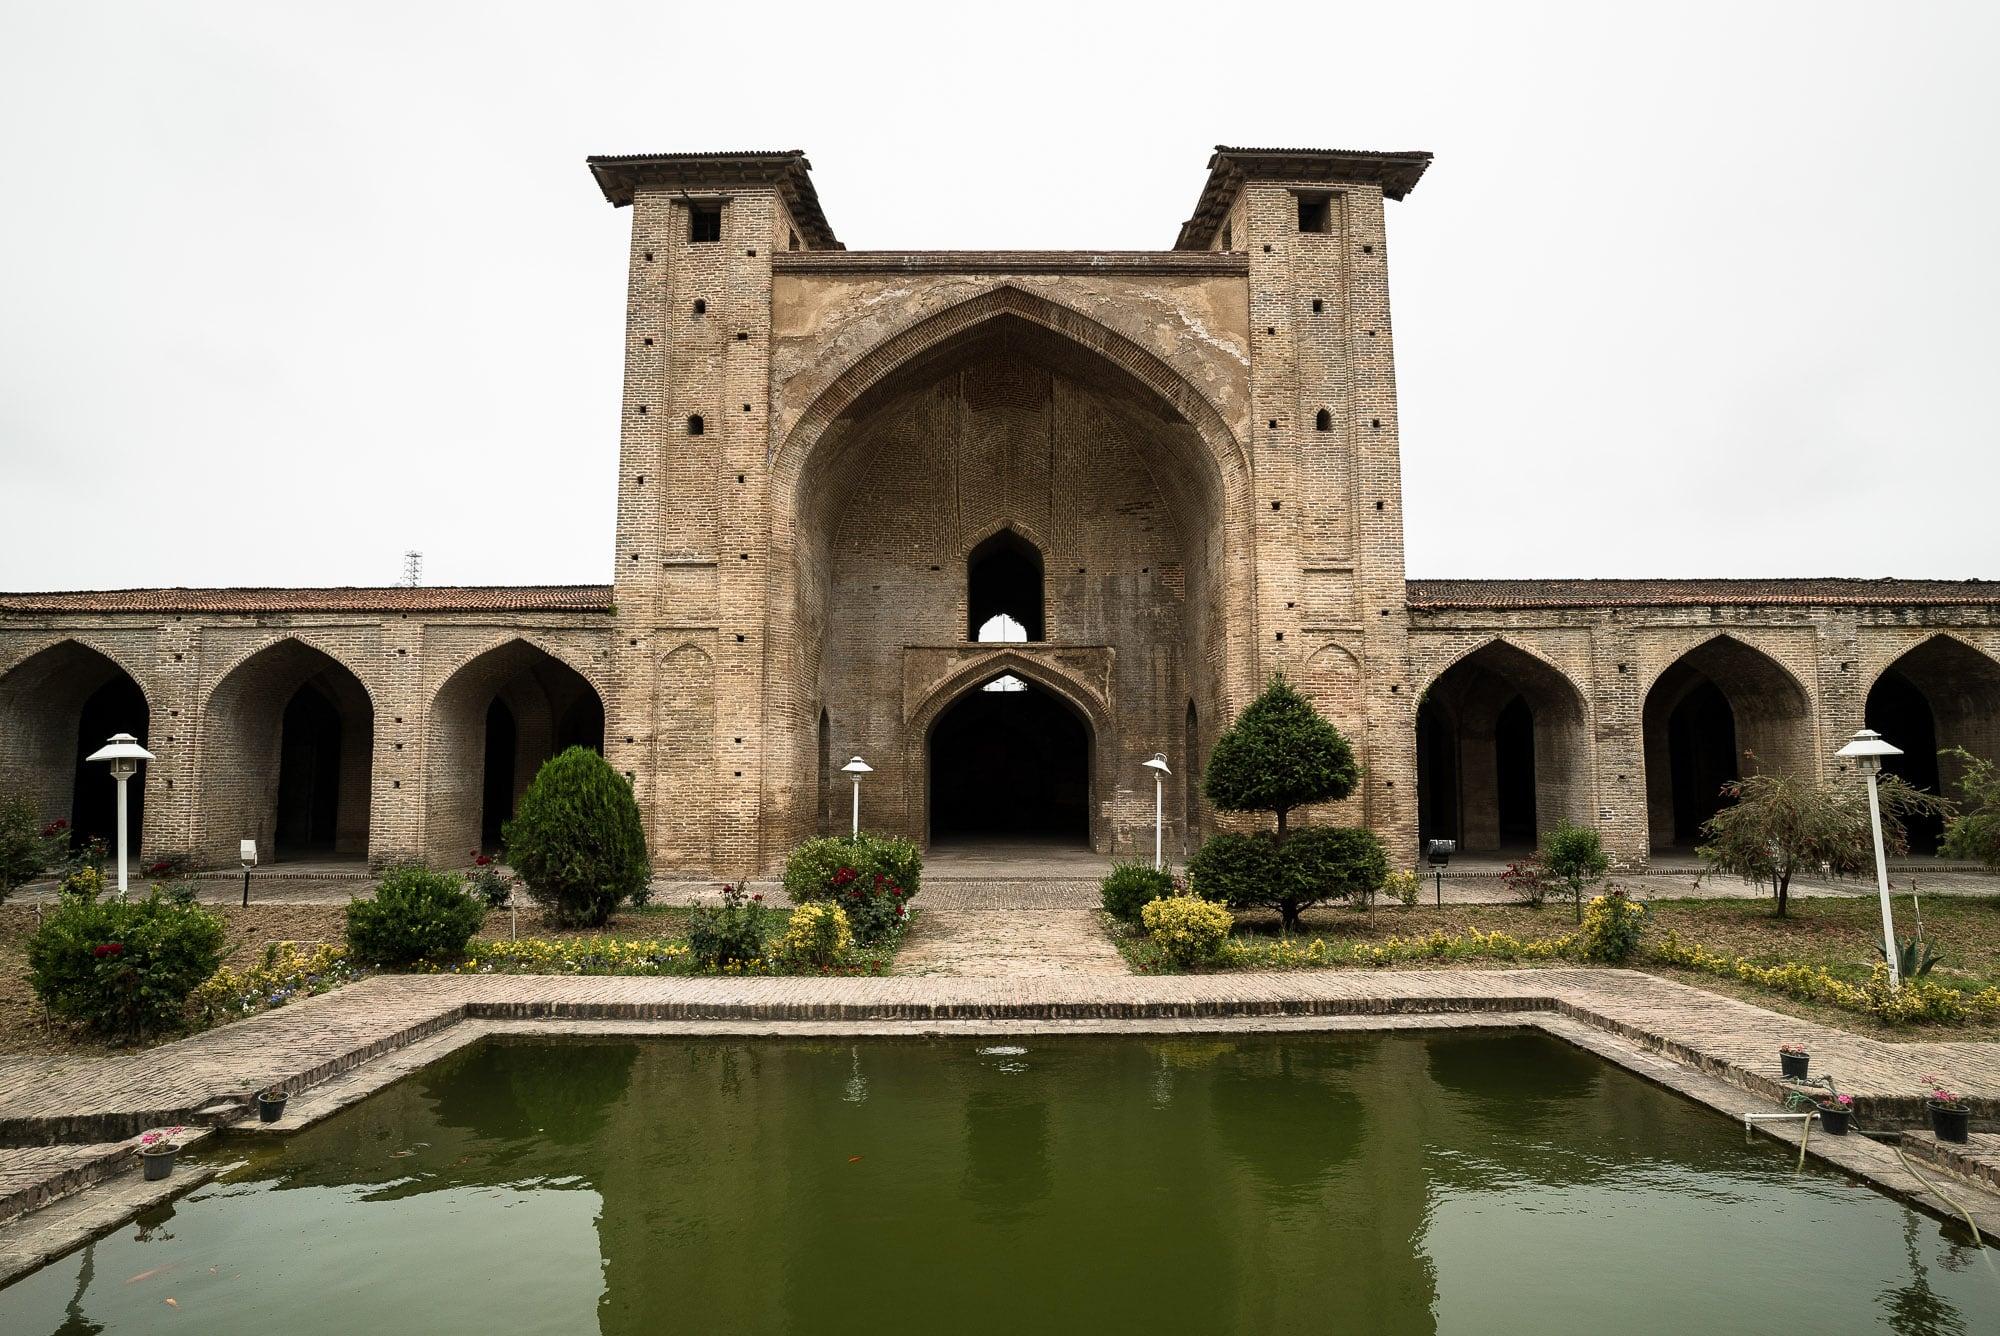 Farah Abad madrasa